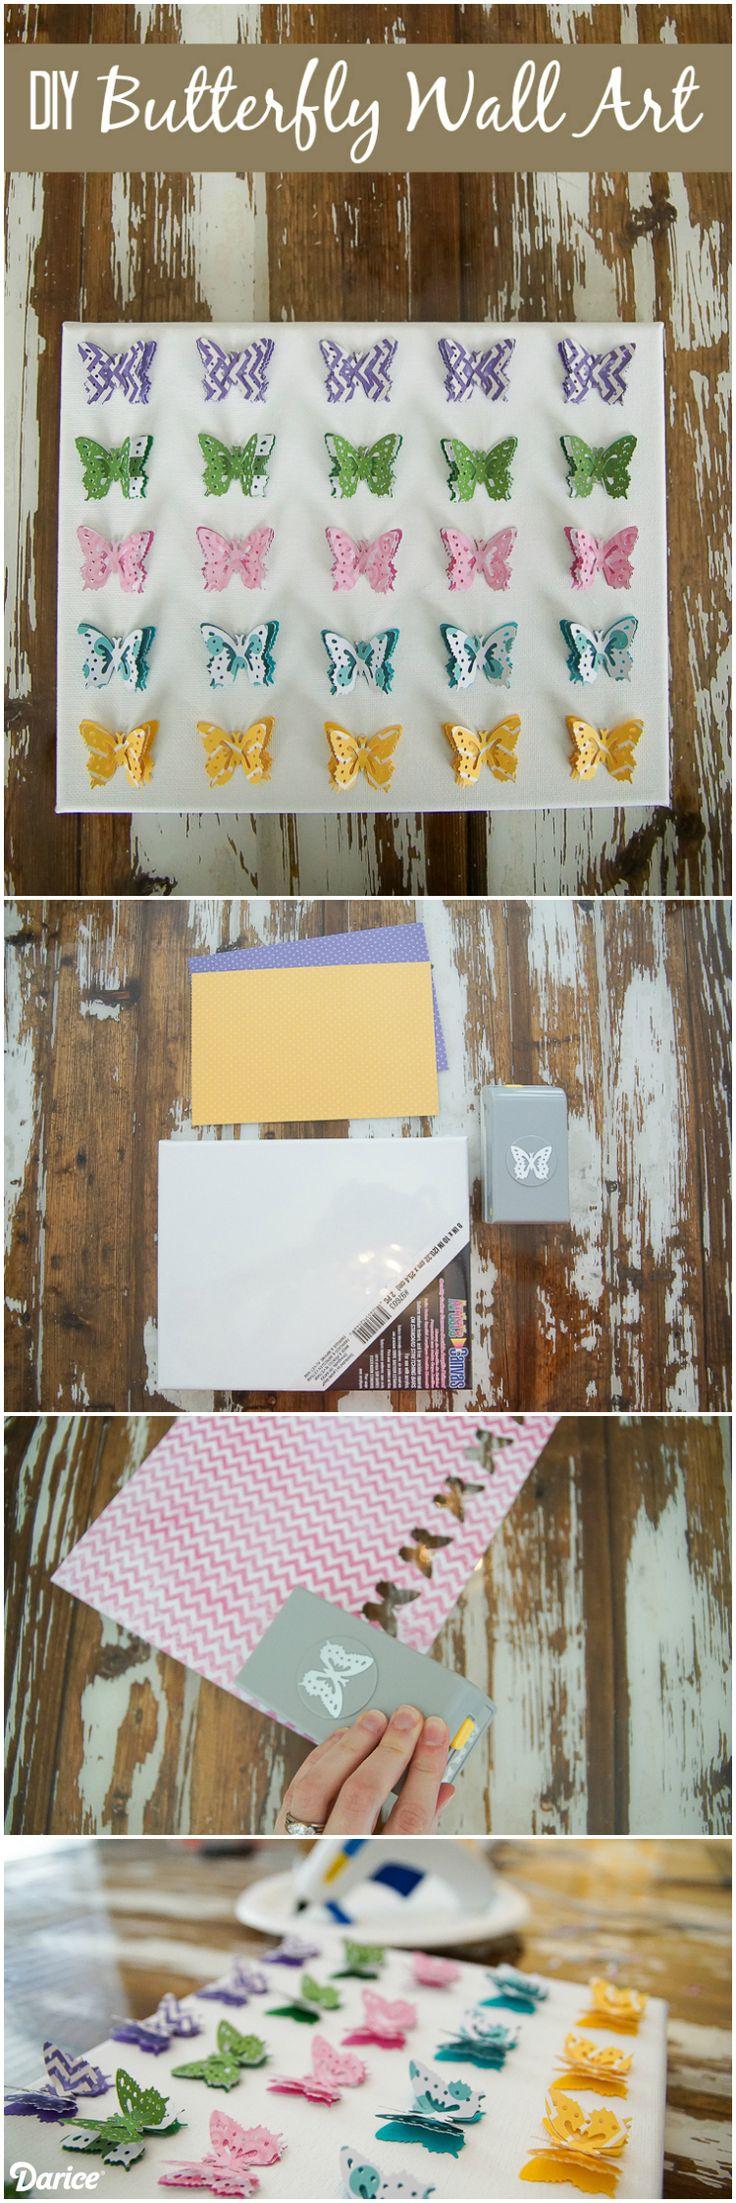 Scrapbook paper art projects - Diy Butterfly Wall Art Project Darice